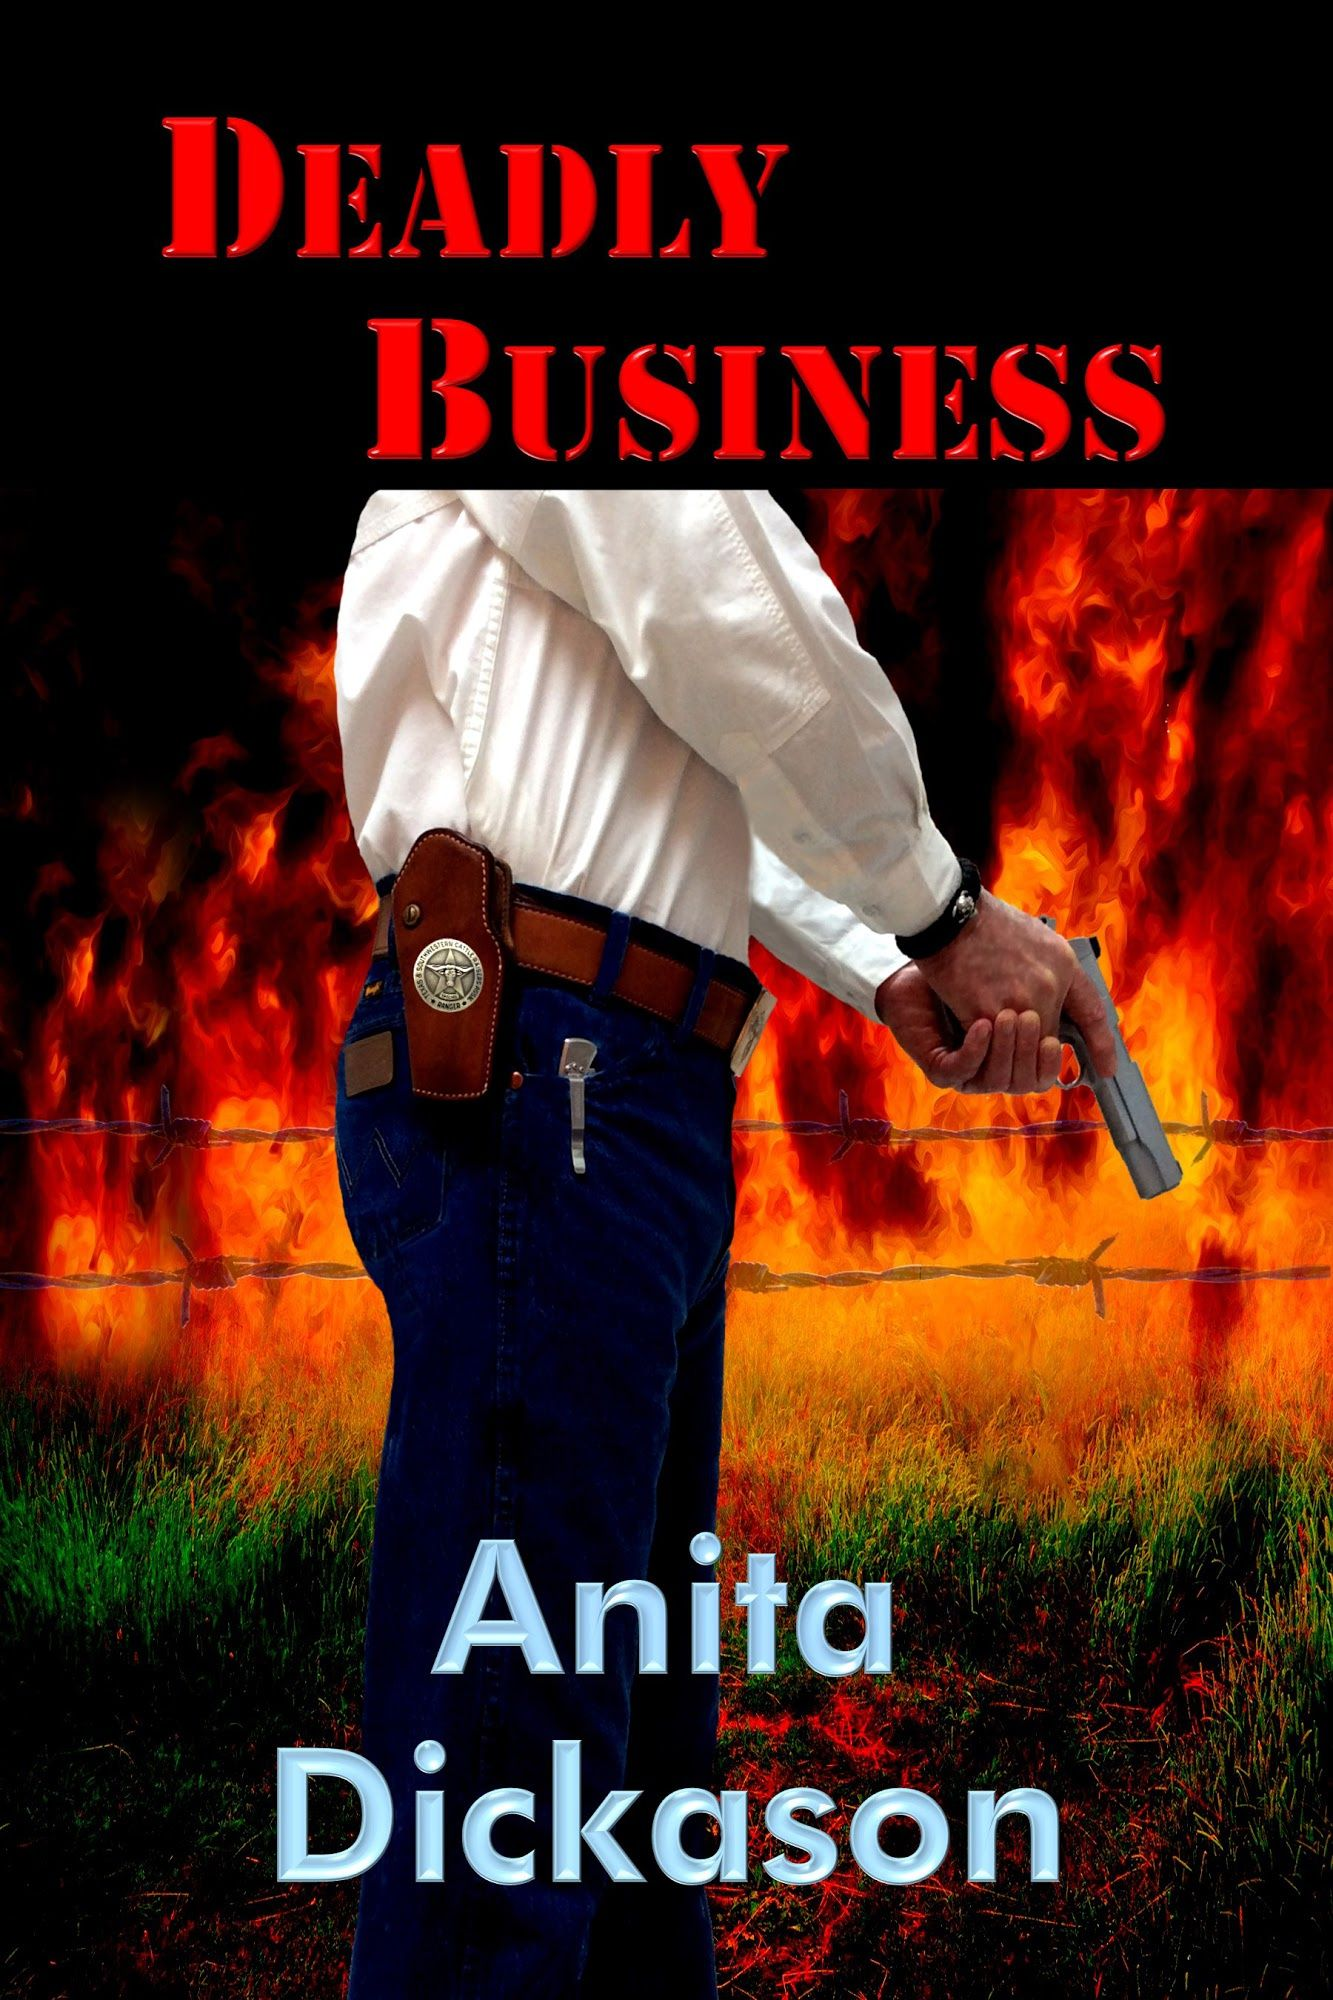 Deadly Business By Anita Dickason